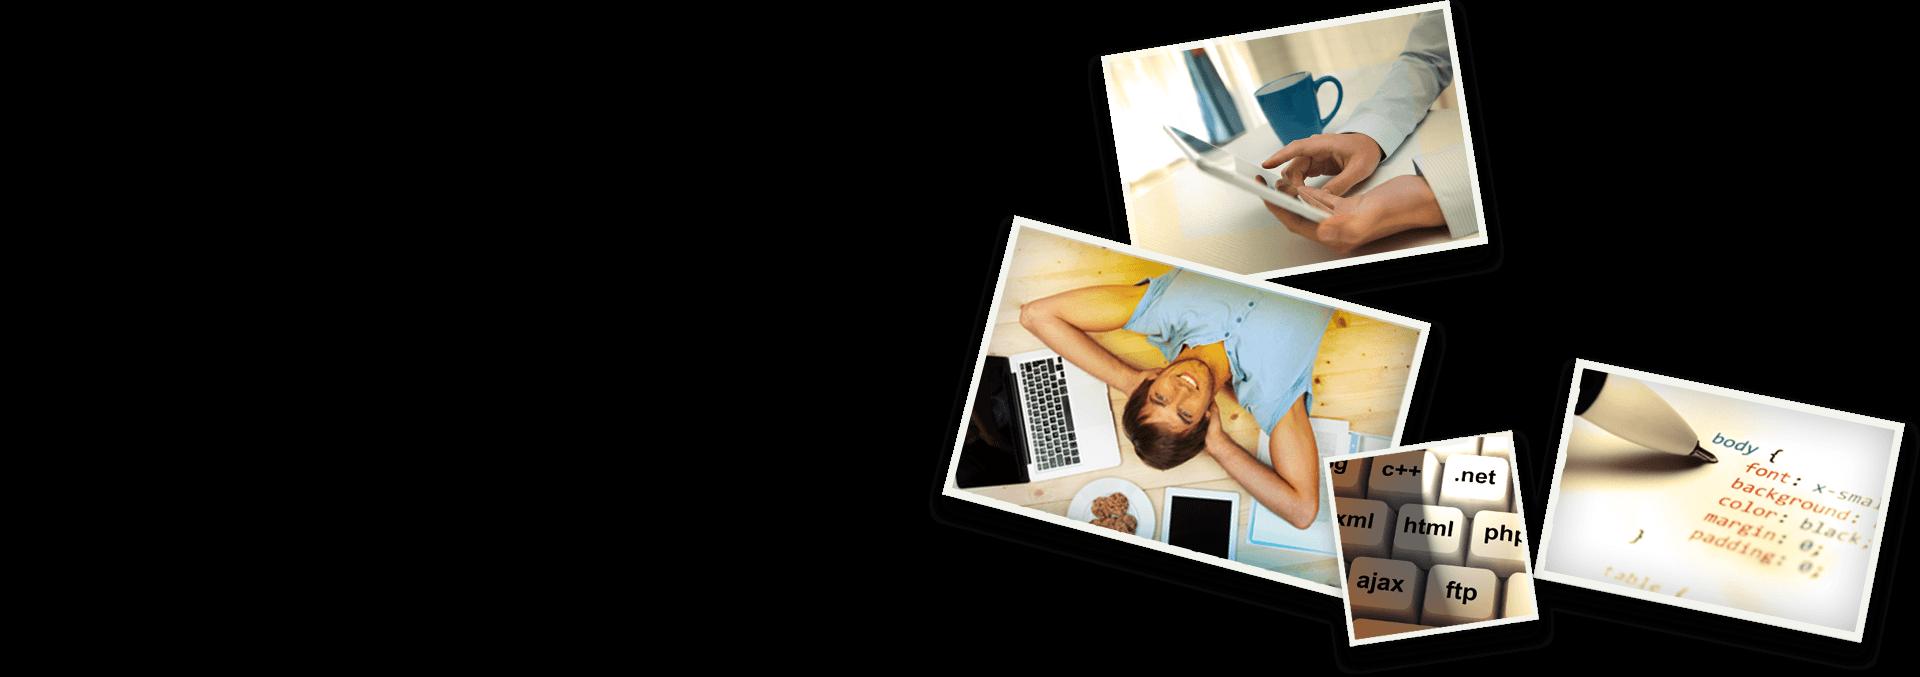 Prestoexperts Online Expert Advice Liveperson Company